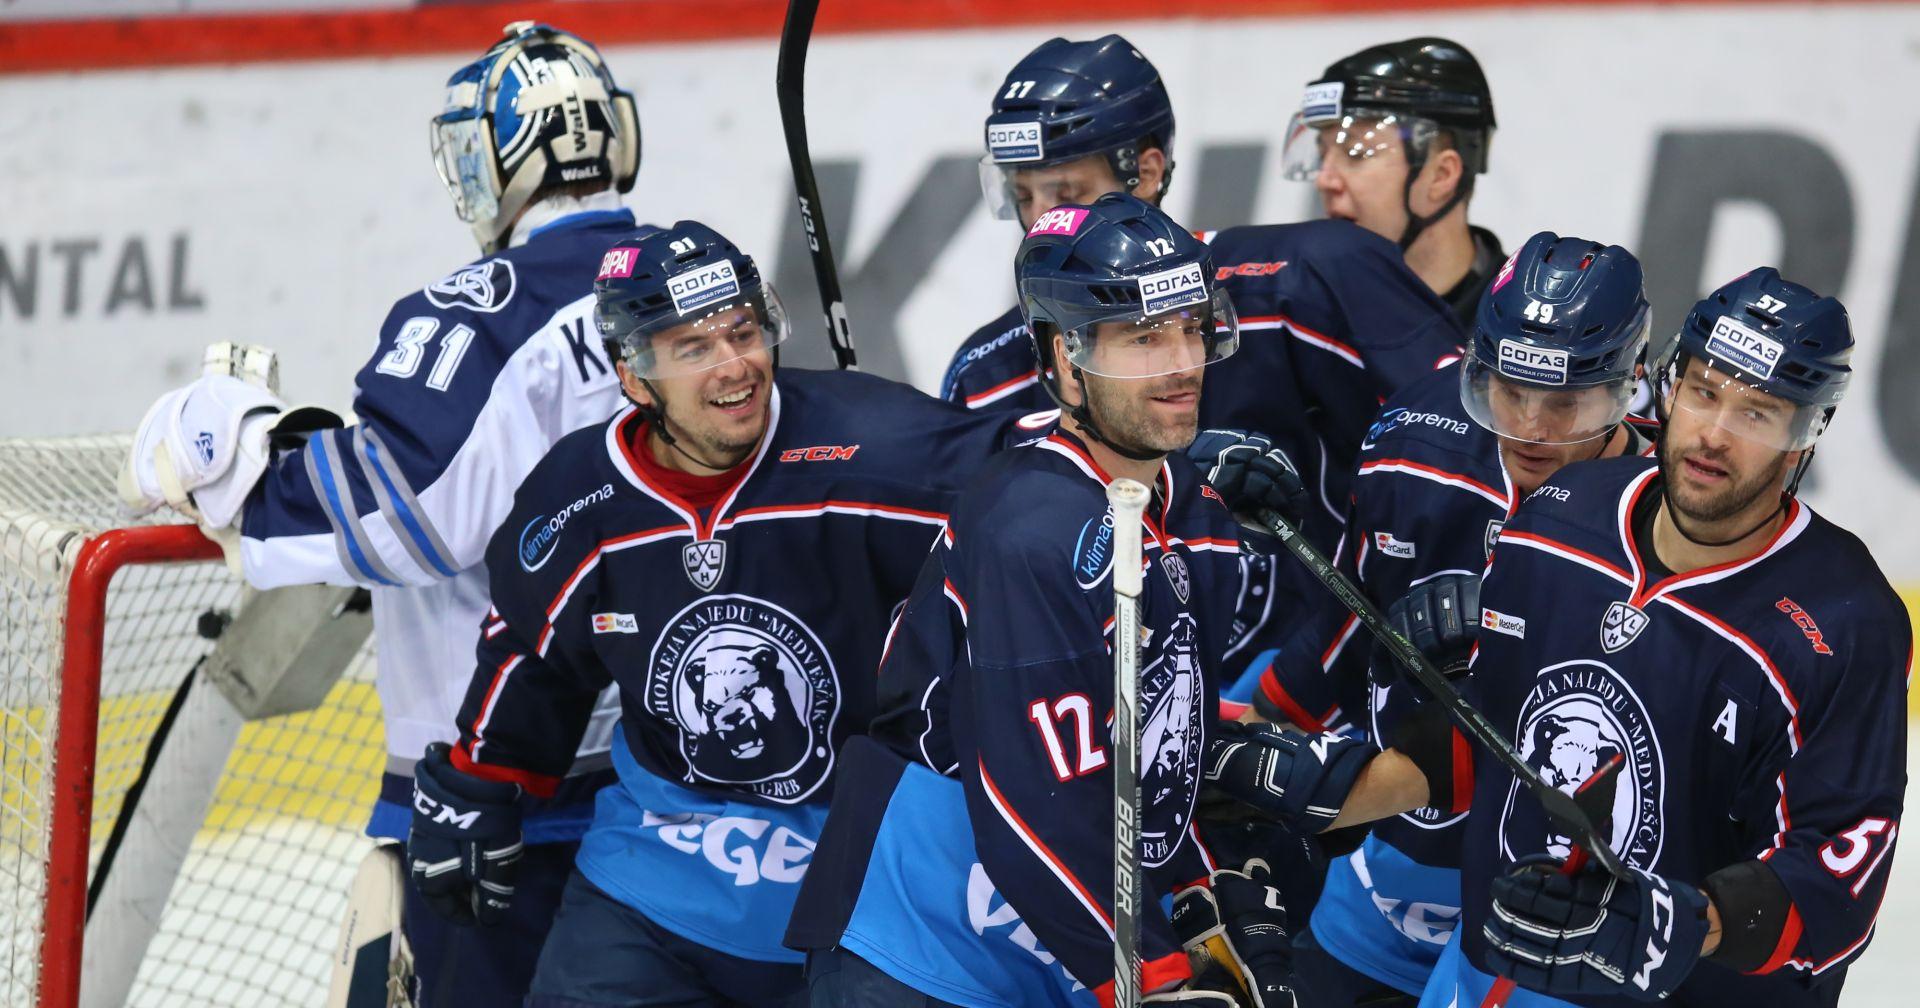 KHL Druga uzastopna pobjeda Medveščaka, u Domu sportova slavili protiv Neftehimika